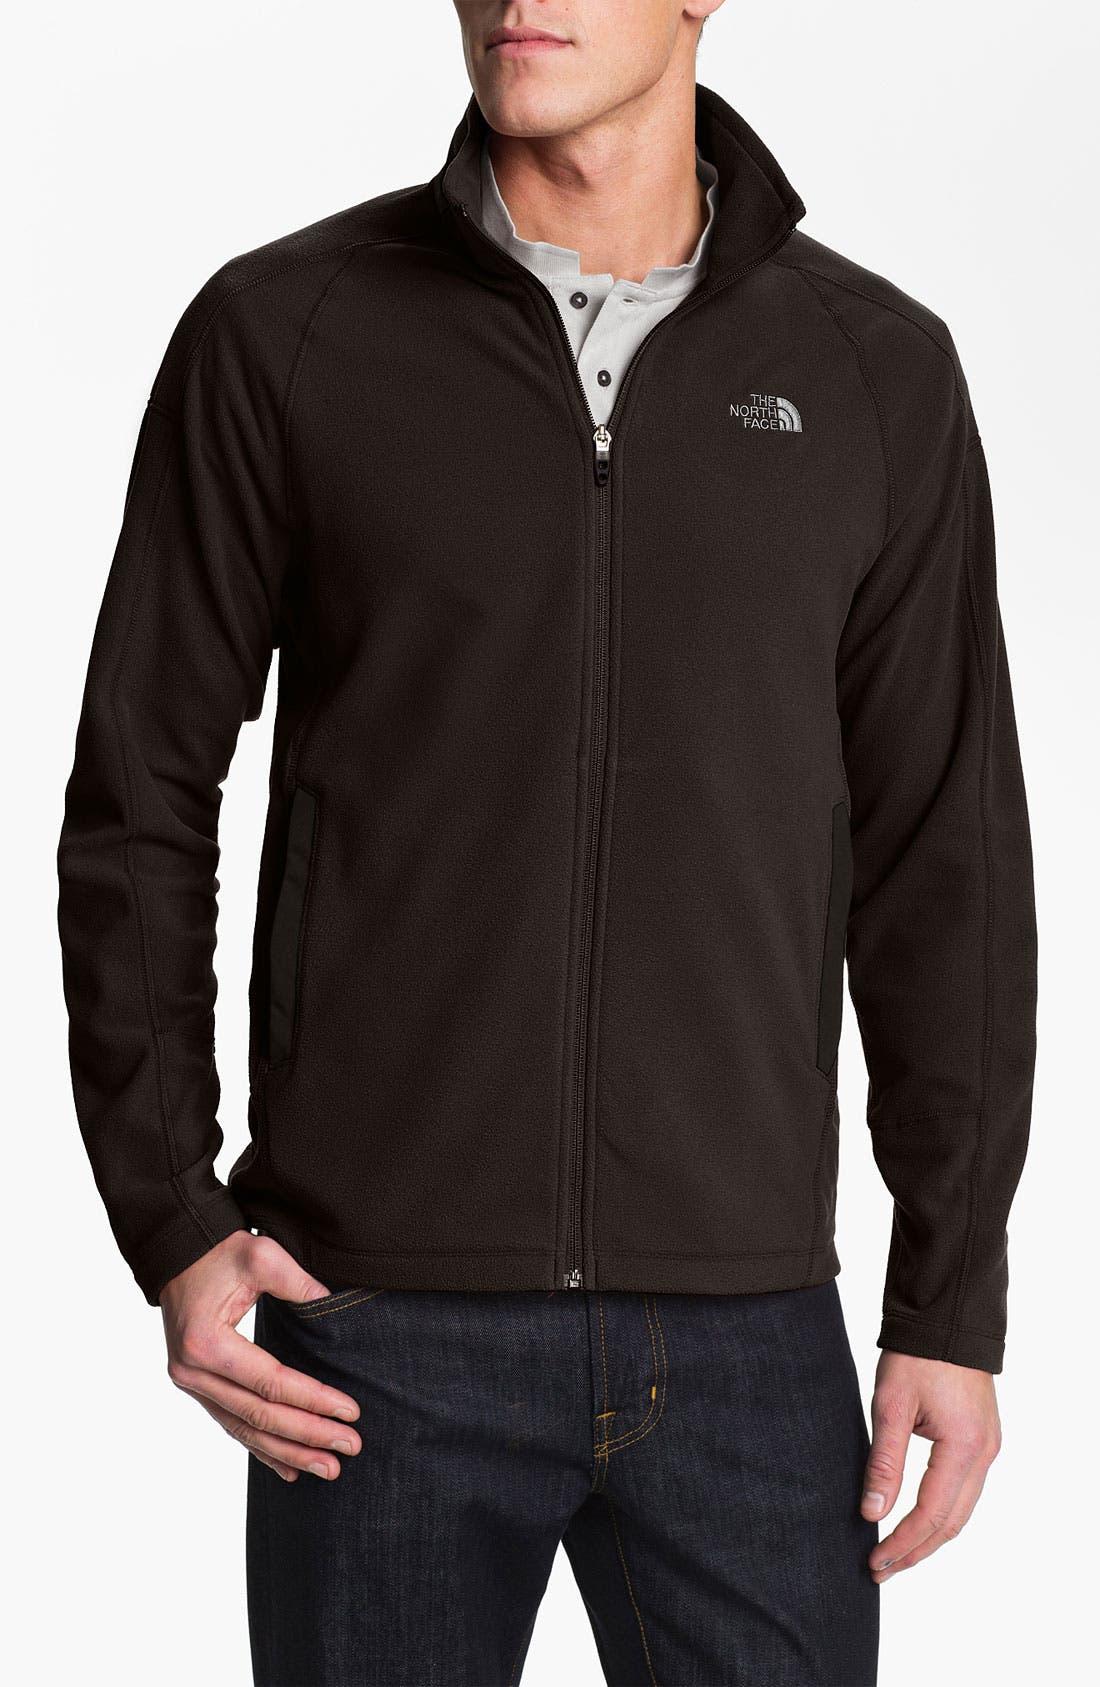 Alternate Image 1 Selected - The North Face 'RDT 100' FlashDry™ Full Zip Fleece Jacket